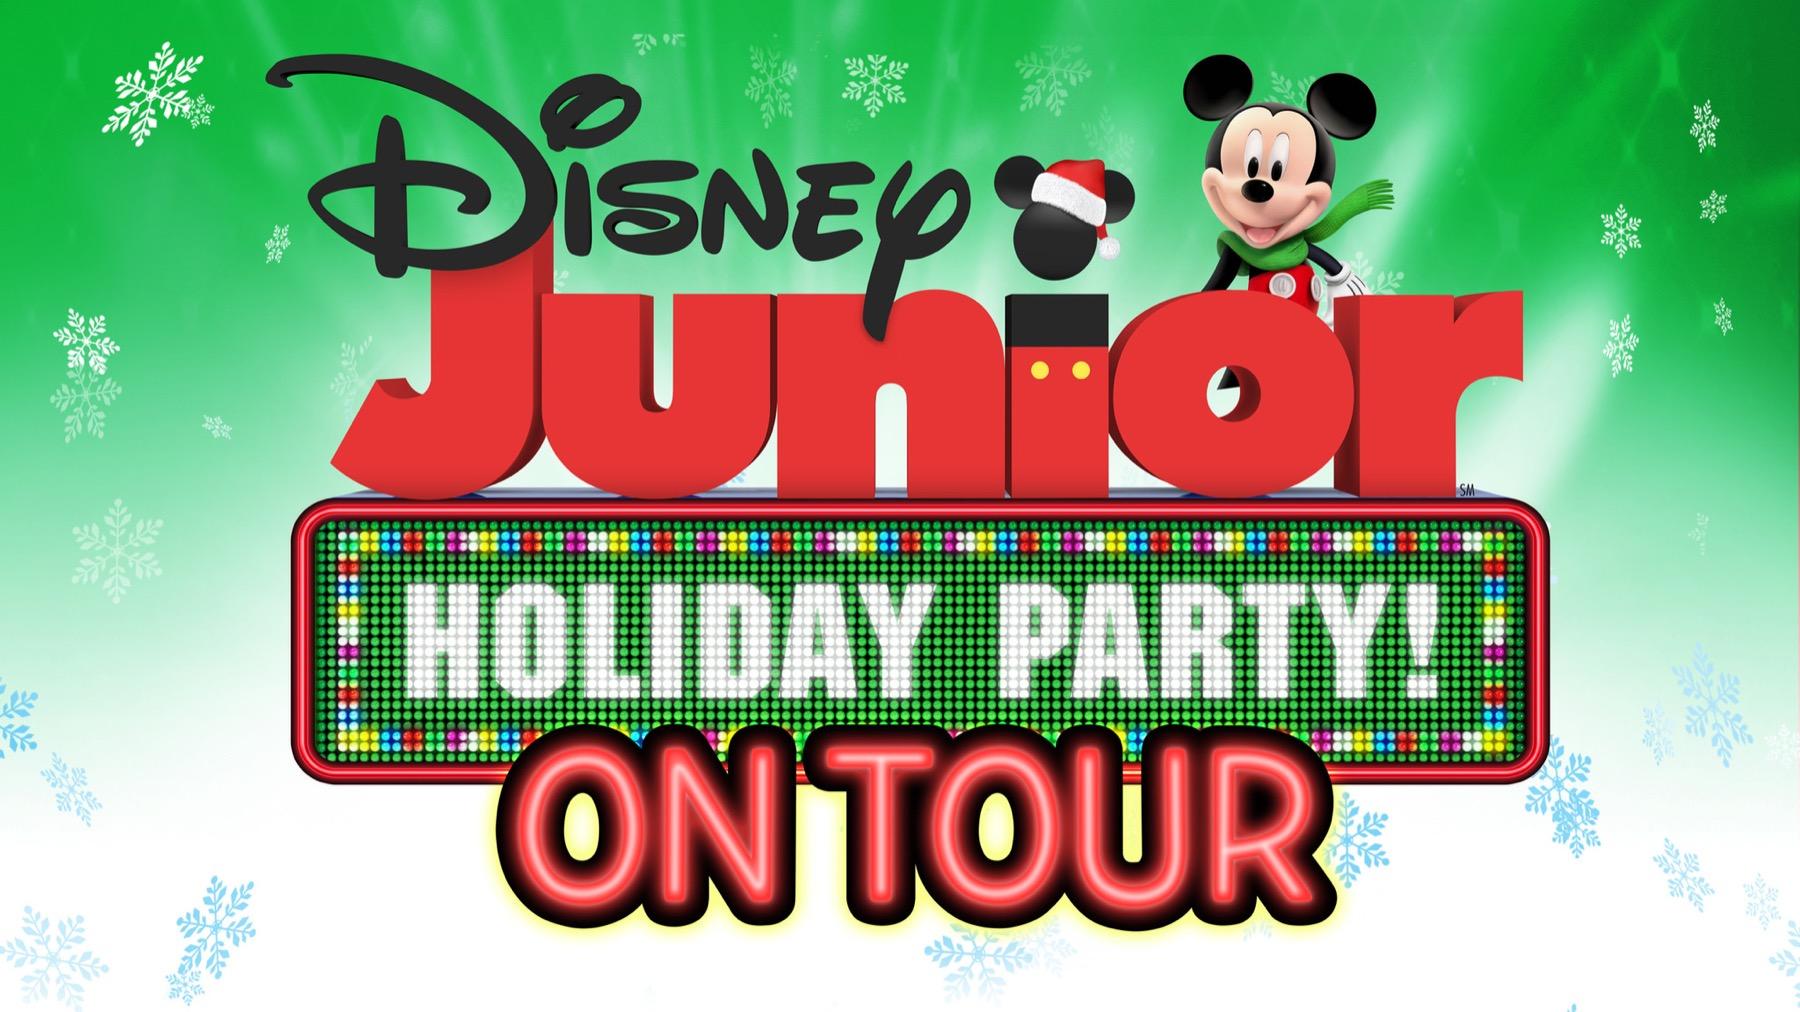 Disney Junior Holiday Party tour Chicago promo